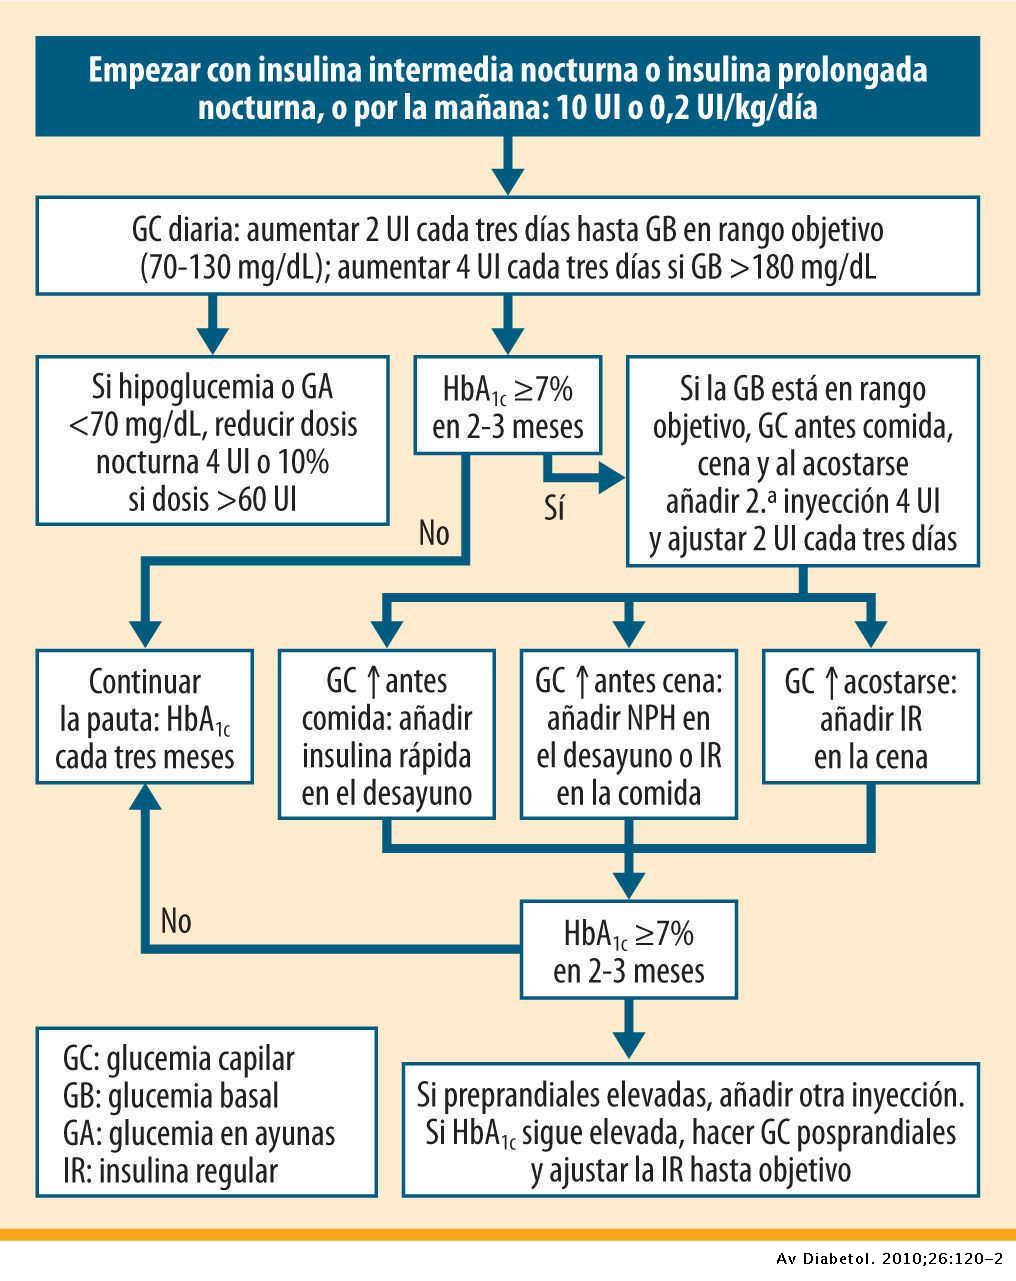 European Association for the Study of Diabetes